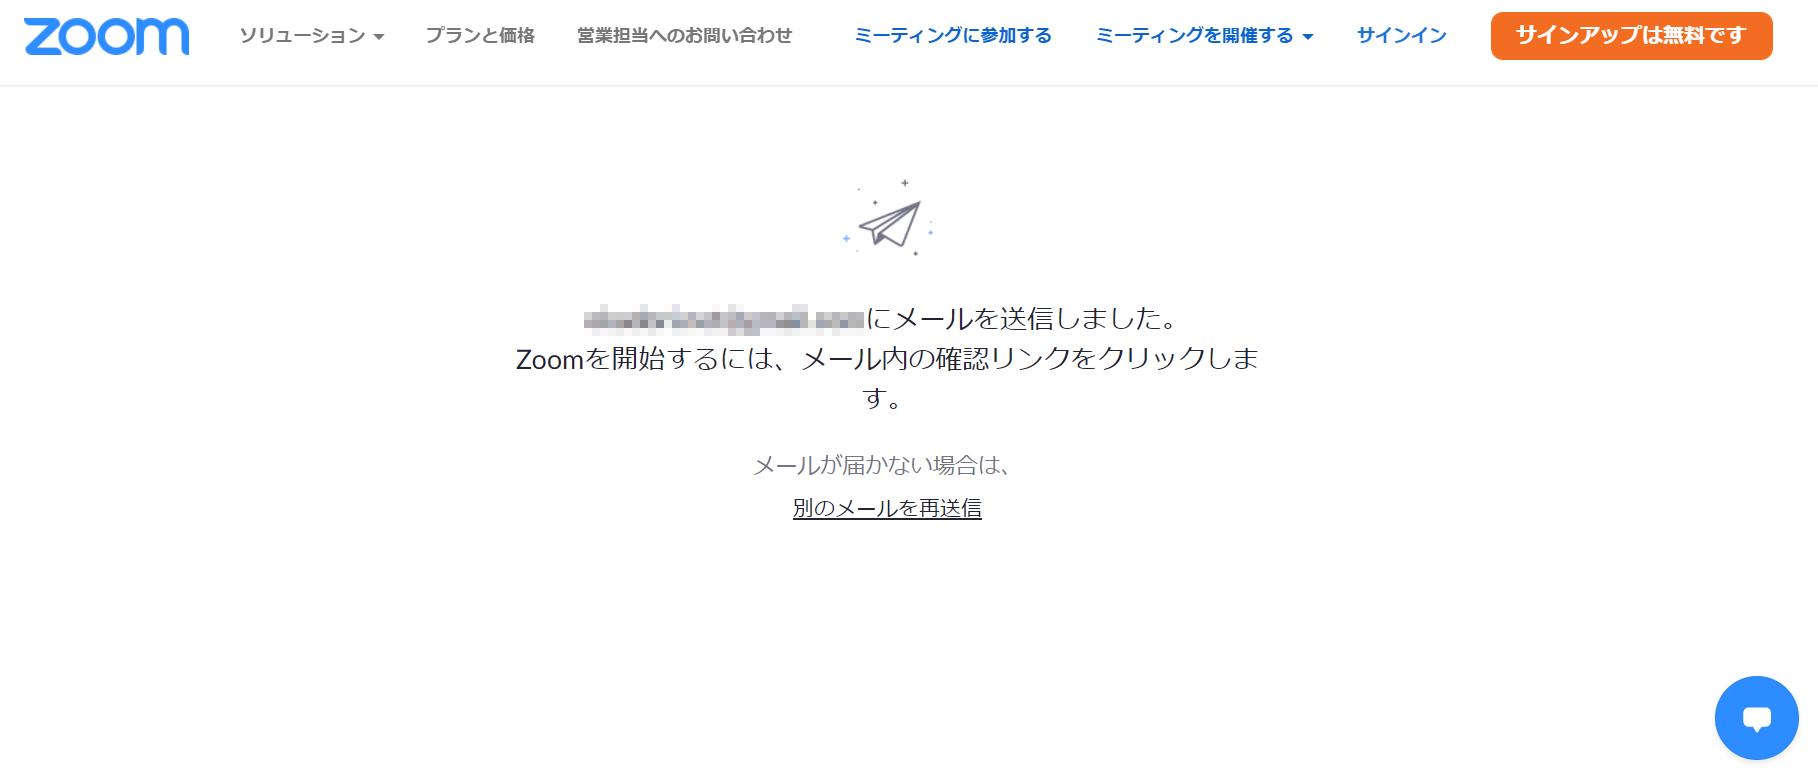 Zoomのアカウントを作成する方法4